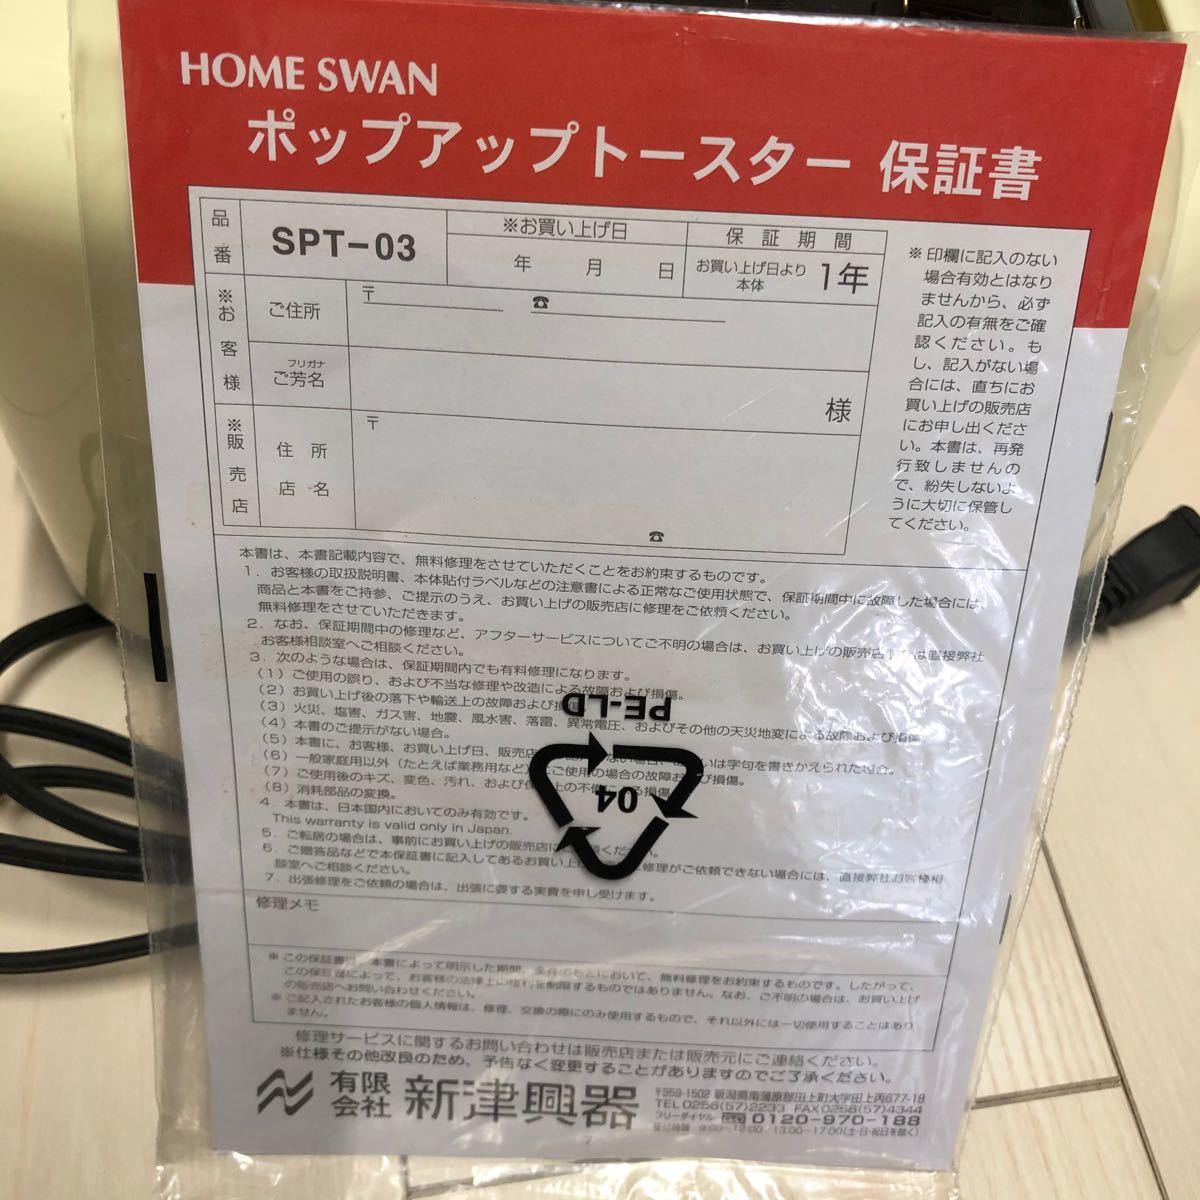 HOME SWAN ホームスワン ポップアップトースター SPT-03